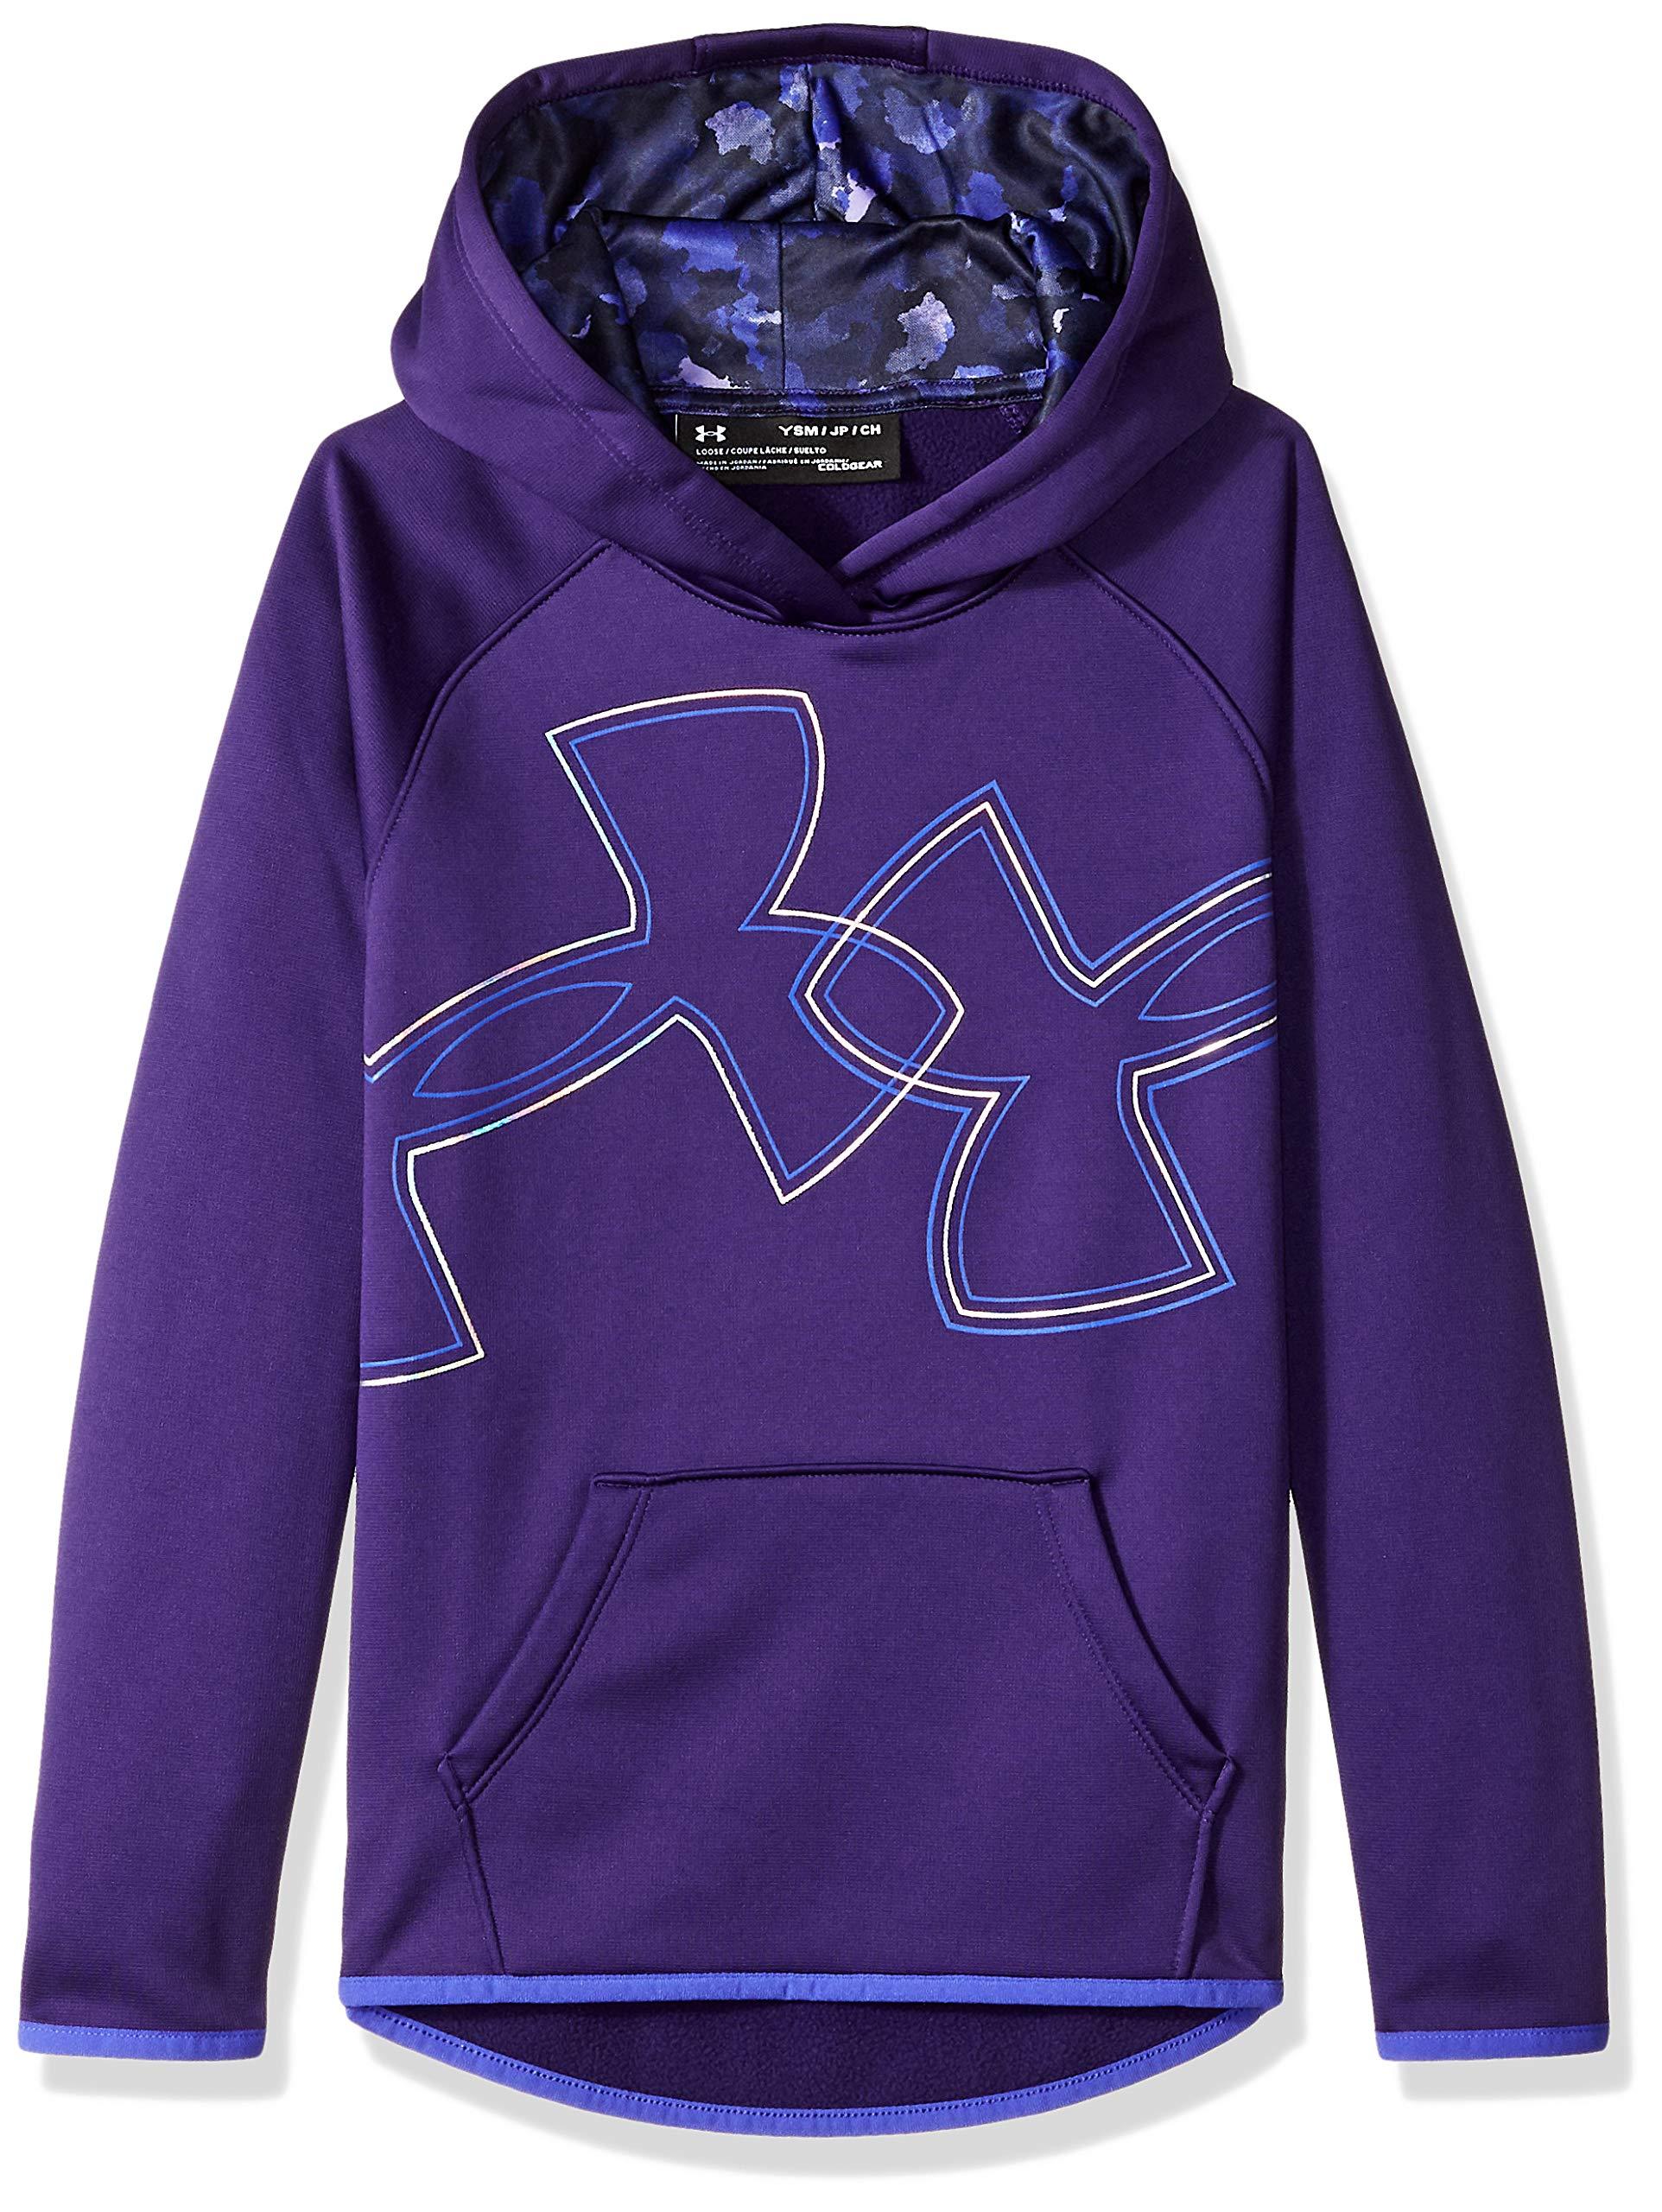 Under Armour Girls Armour Fleece Dual Logo Hoodie, Purple (500), Youth Medium by Under Armour